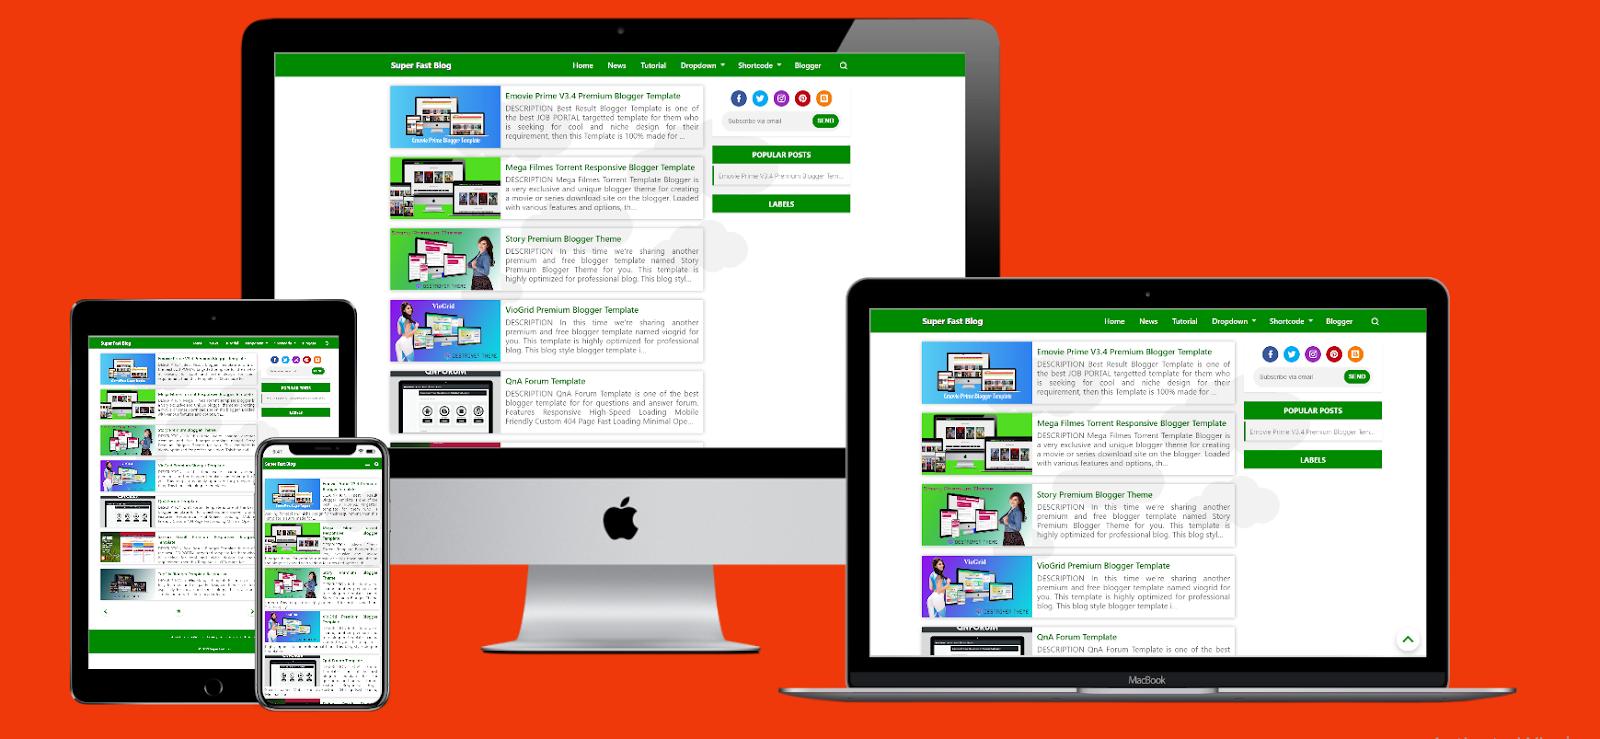 Super Fast Blog Premium Blogger Theme